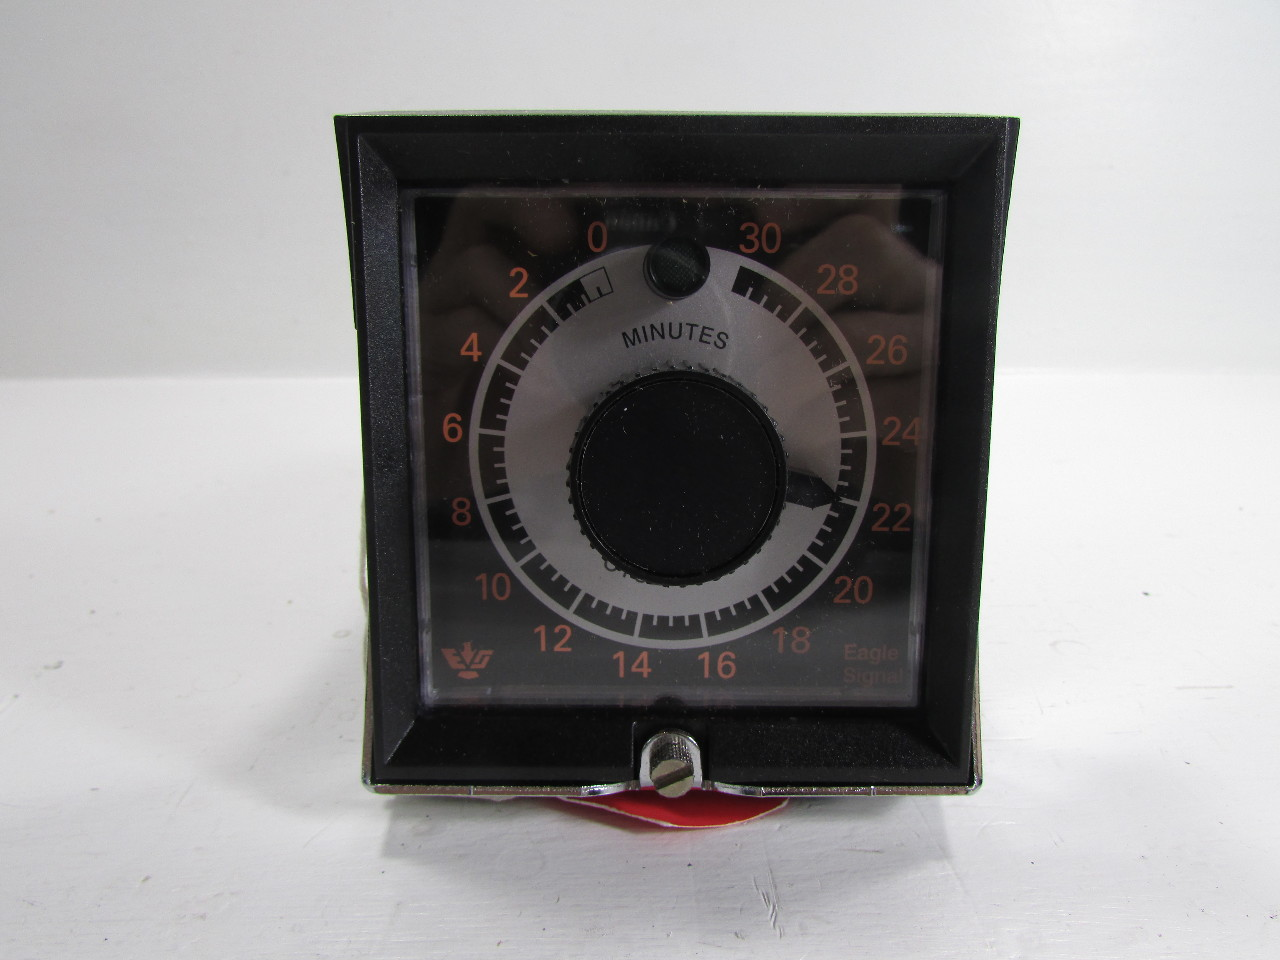 Eagle Signal Hp55a6 Cycle Flex Timer 0 30 Minutes